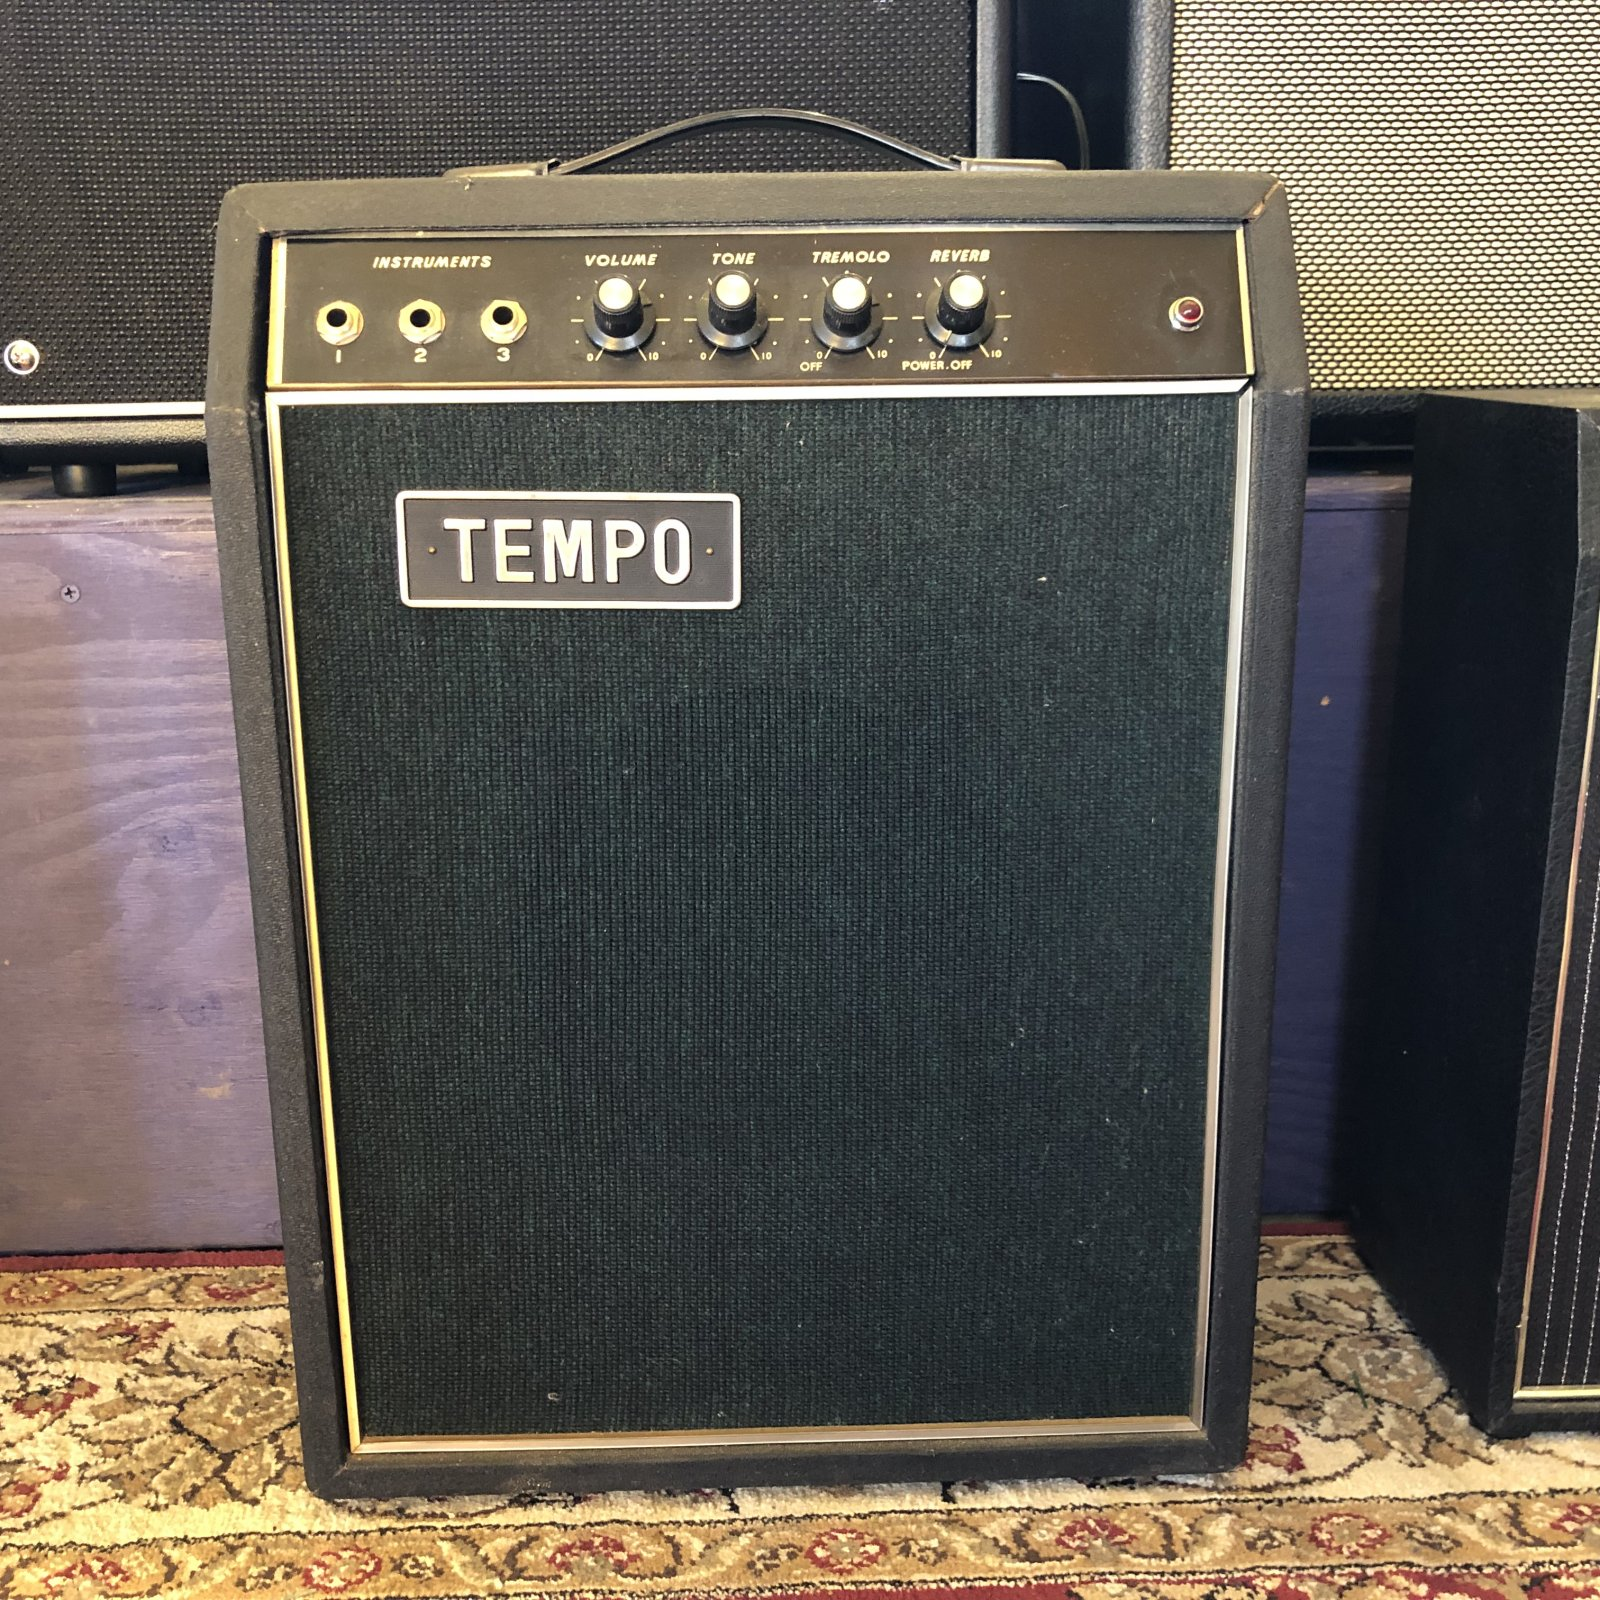 Vintage Tempo Guitar Amp